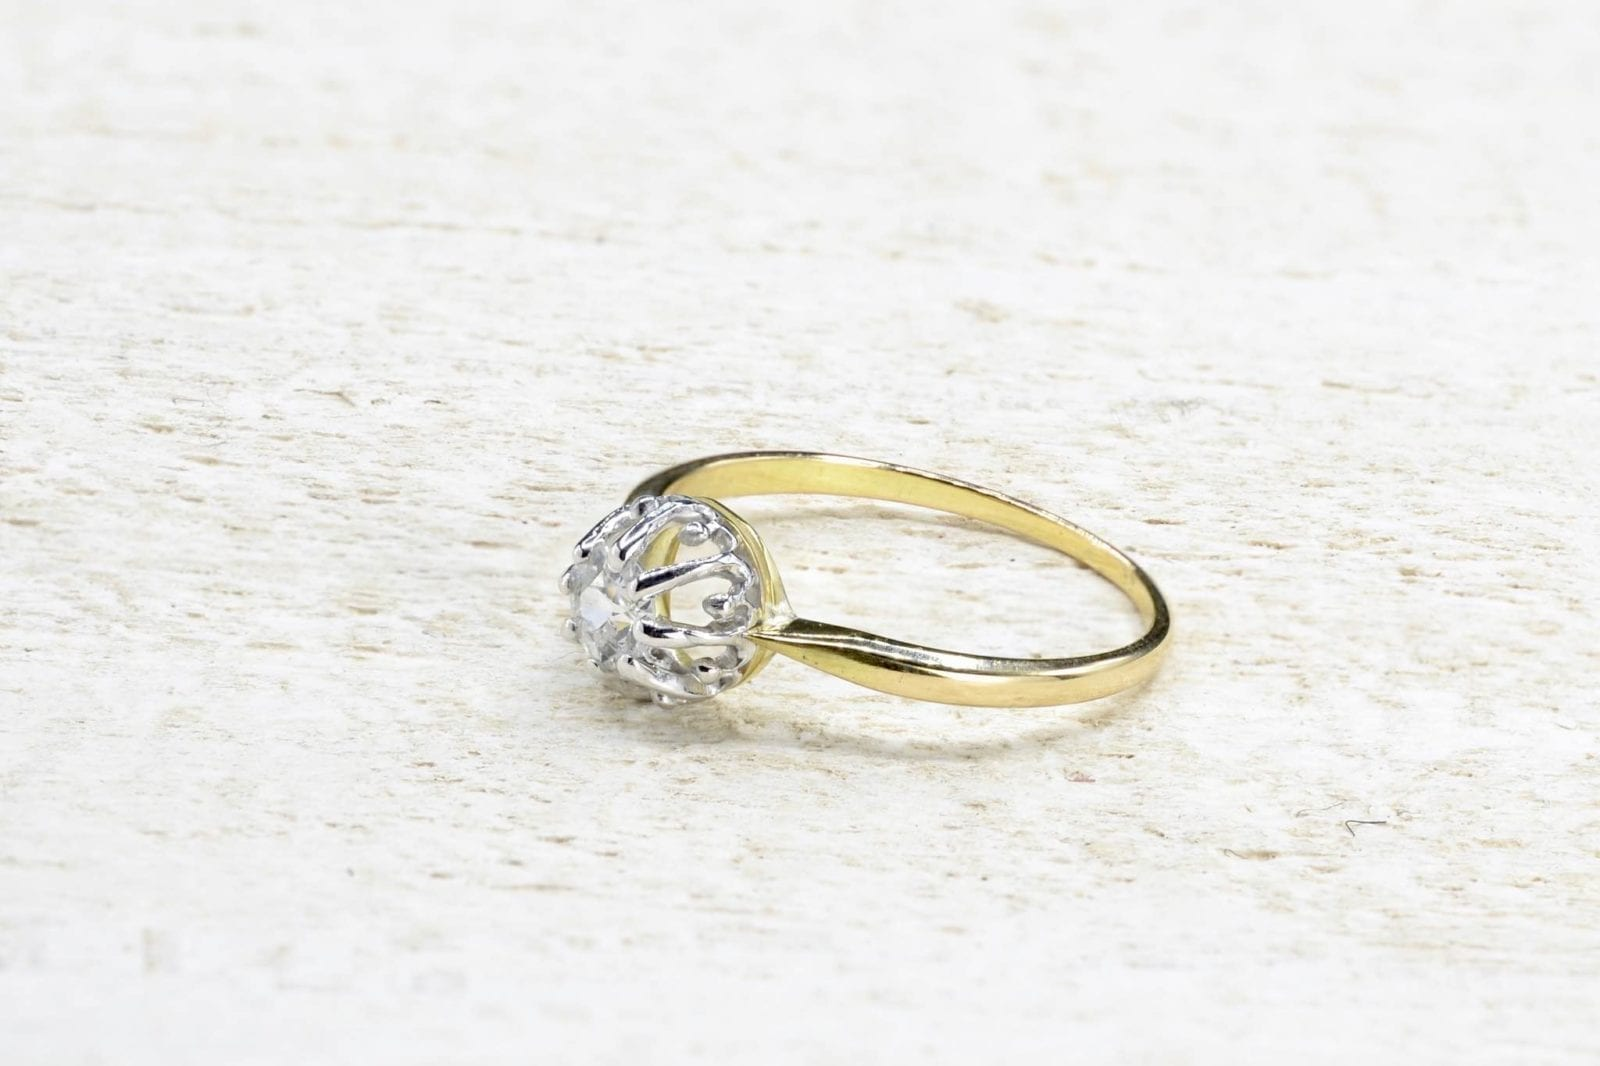 Bague vintage or diamant